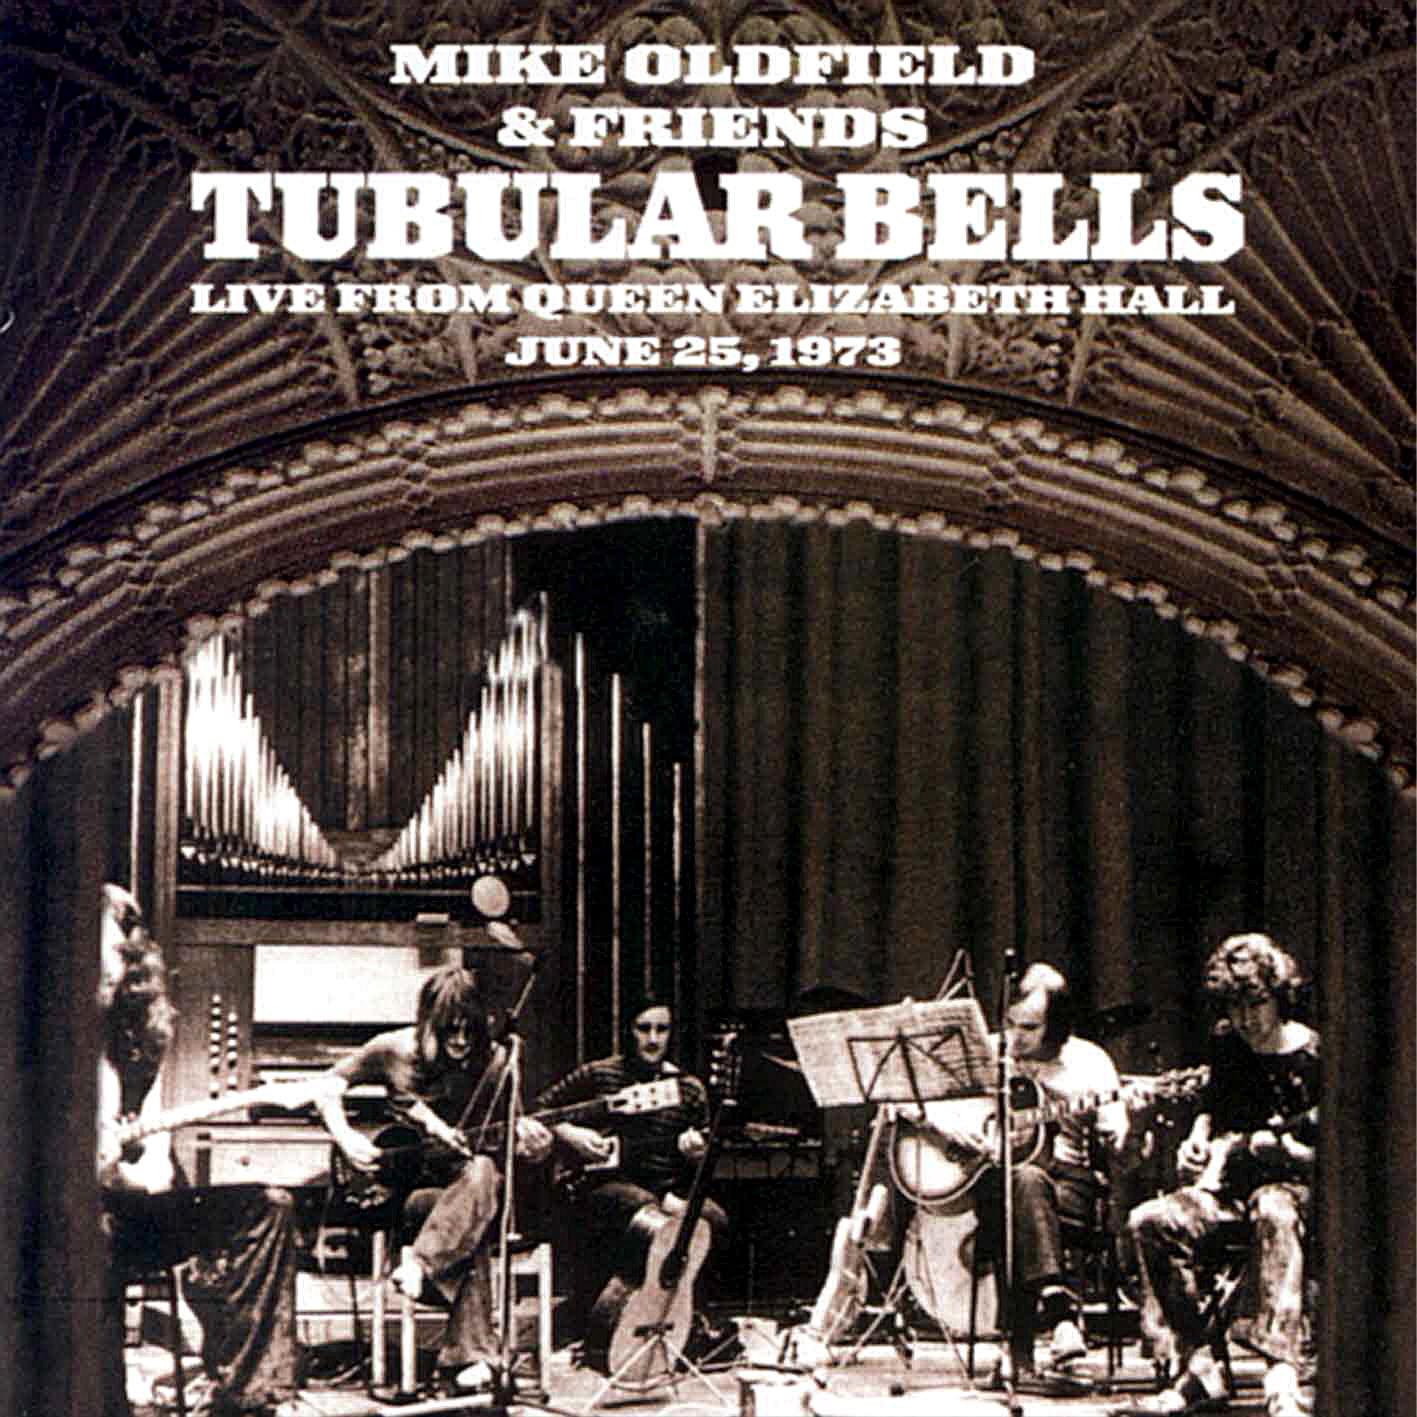 Tubular Bells ของ Mike Oldfield จะกลับมาแสดงในลอนดอนในฤดูร้อนนี้ 2